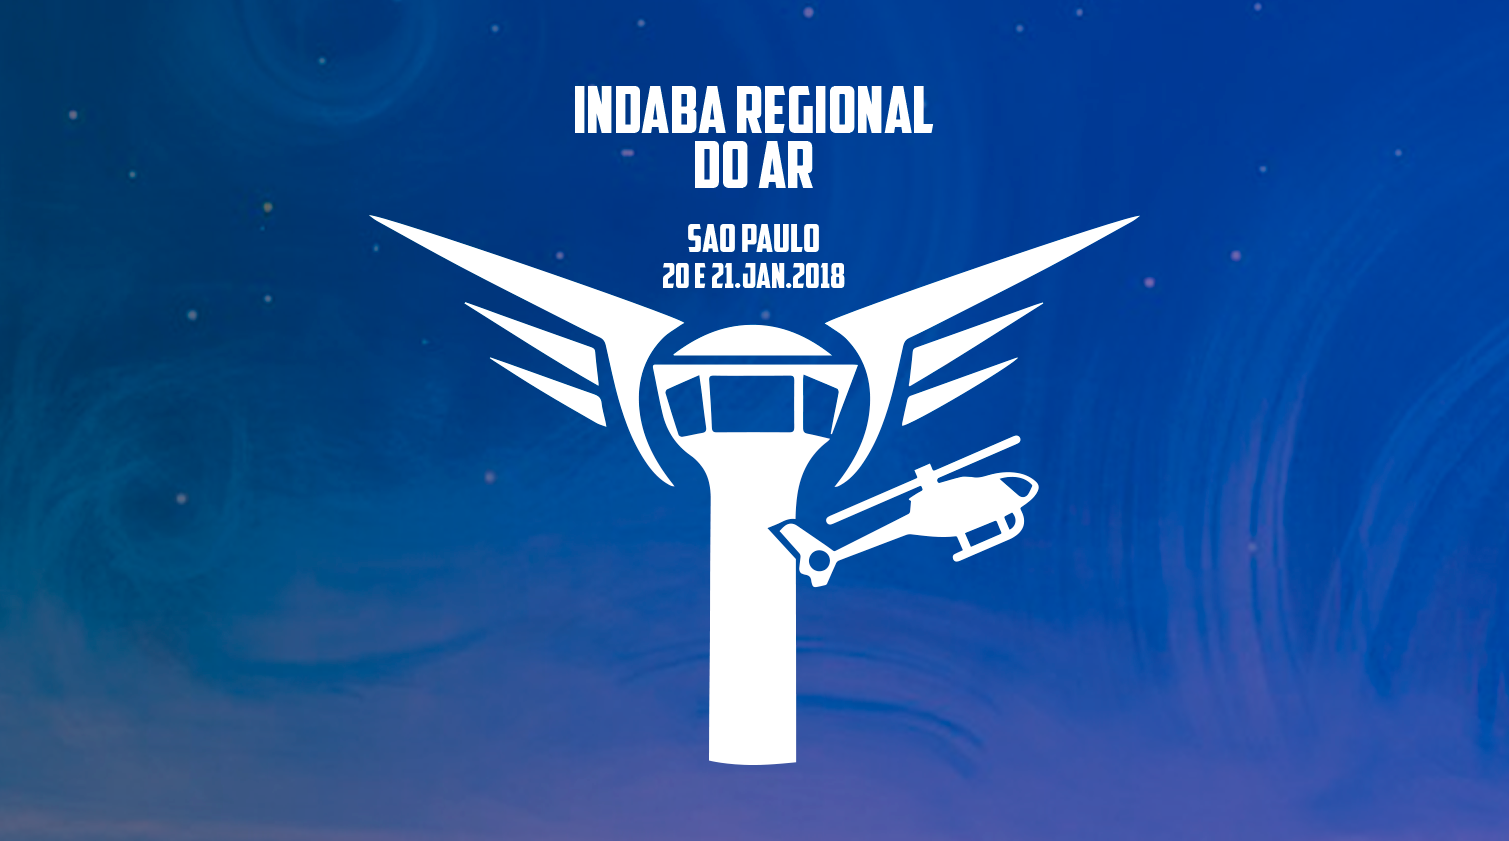 Indaba Regional do Ar 2018